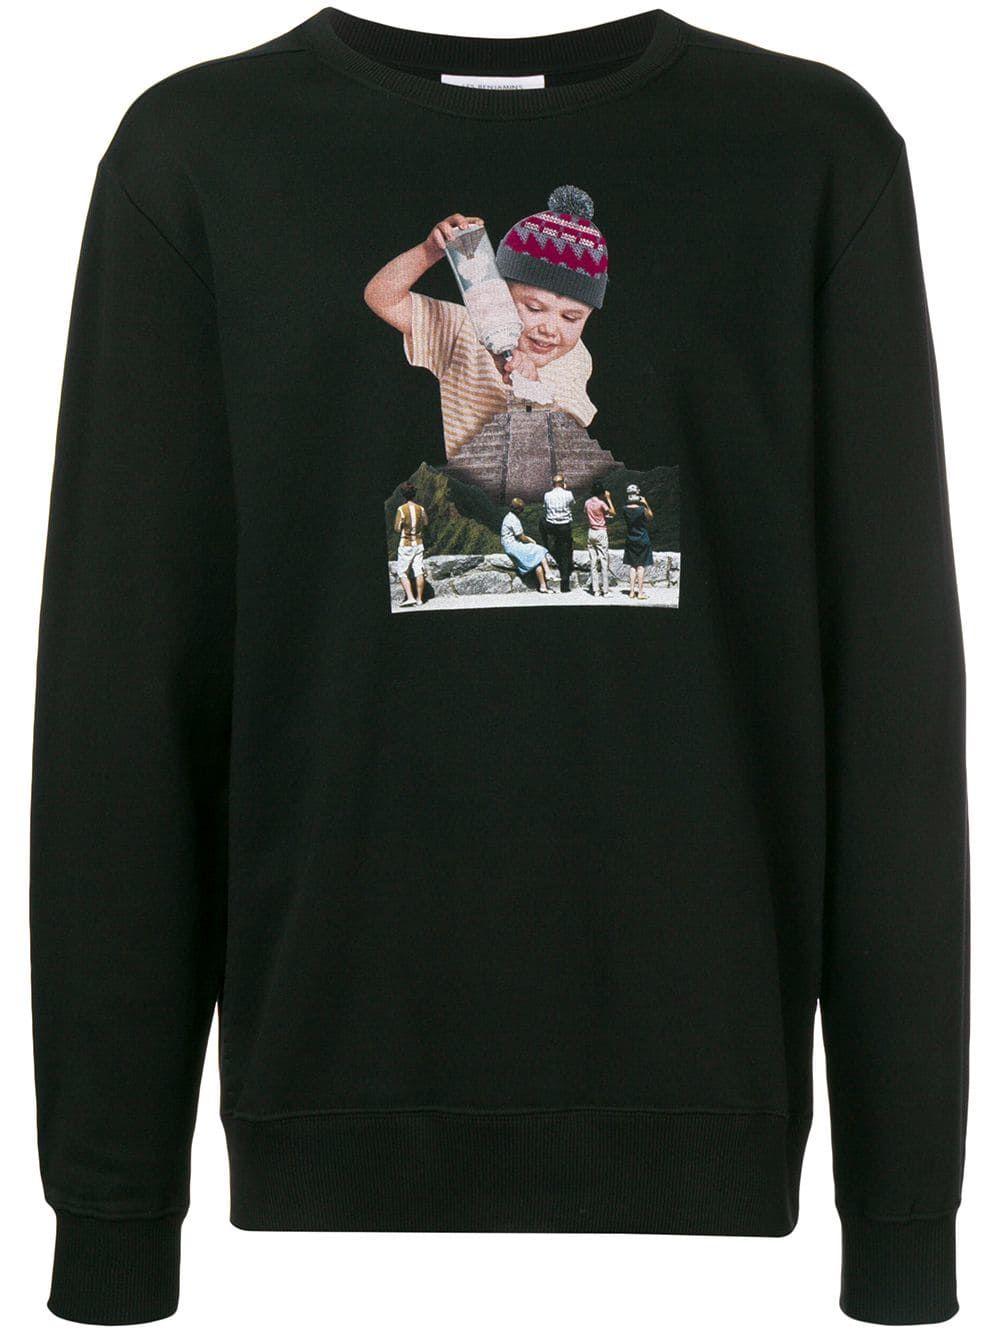 lesbenjamins Les Black Collage Print cloth Benjamins Sweatshirt wAR0v